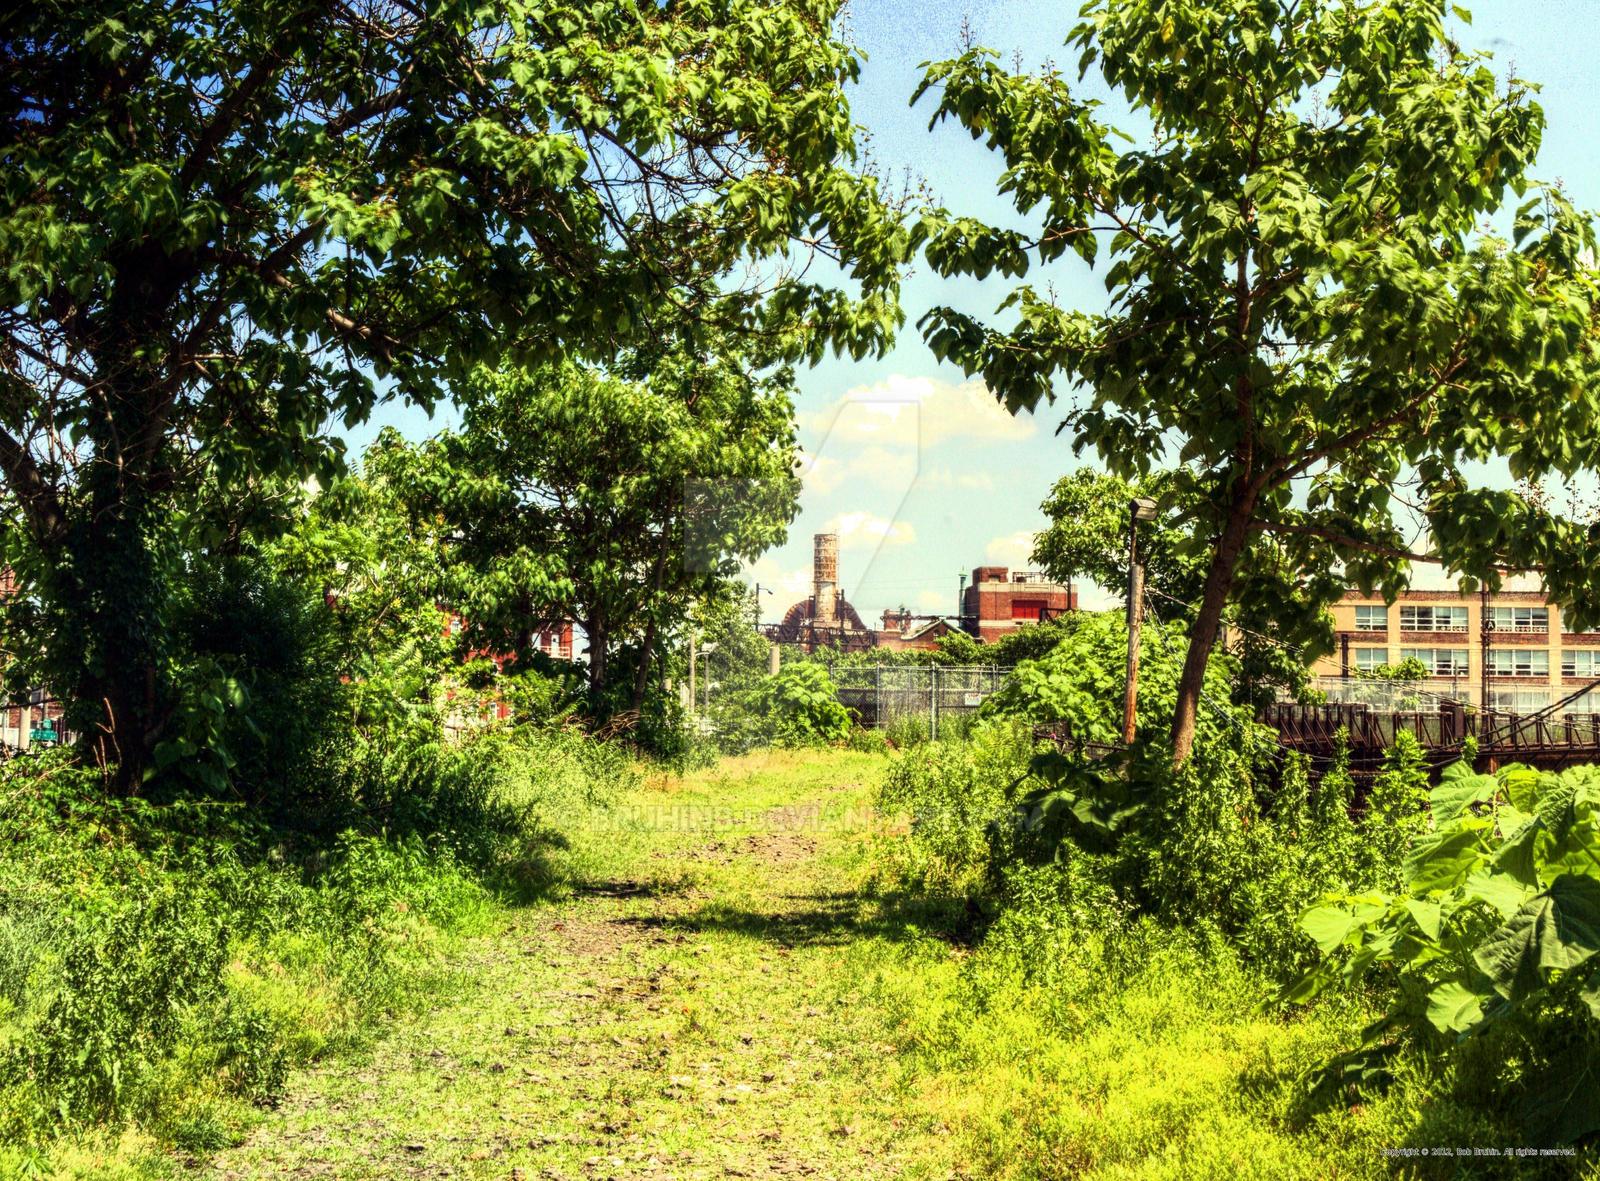 Panorama 1710 hdr pregamma 1 mantiuk contrast  by bruhinb